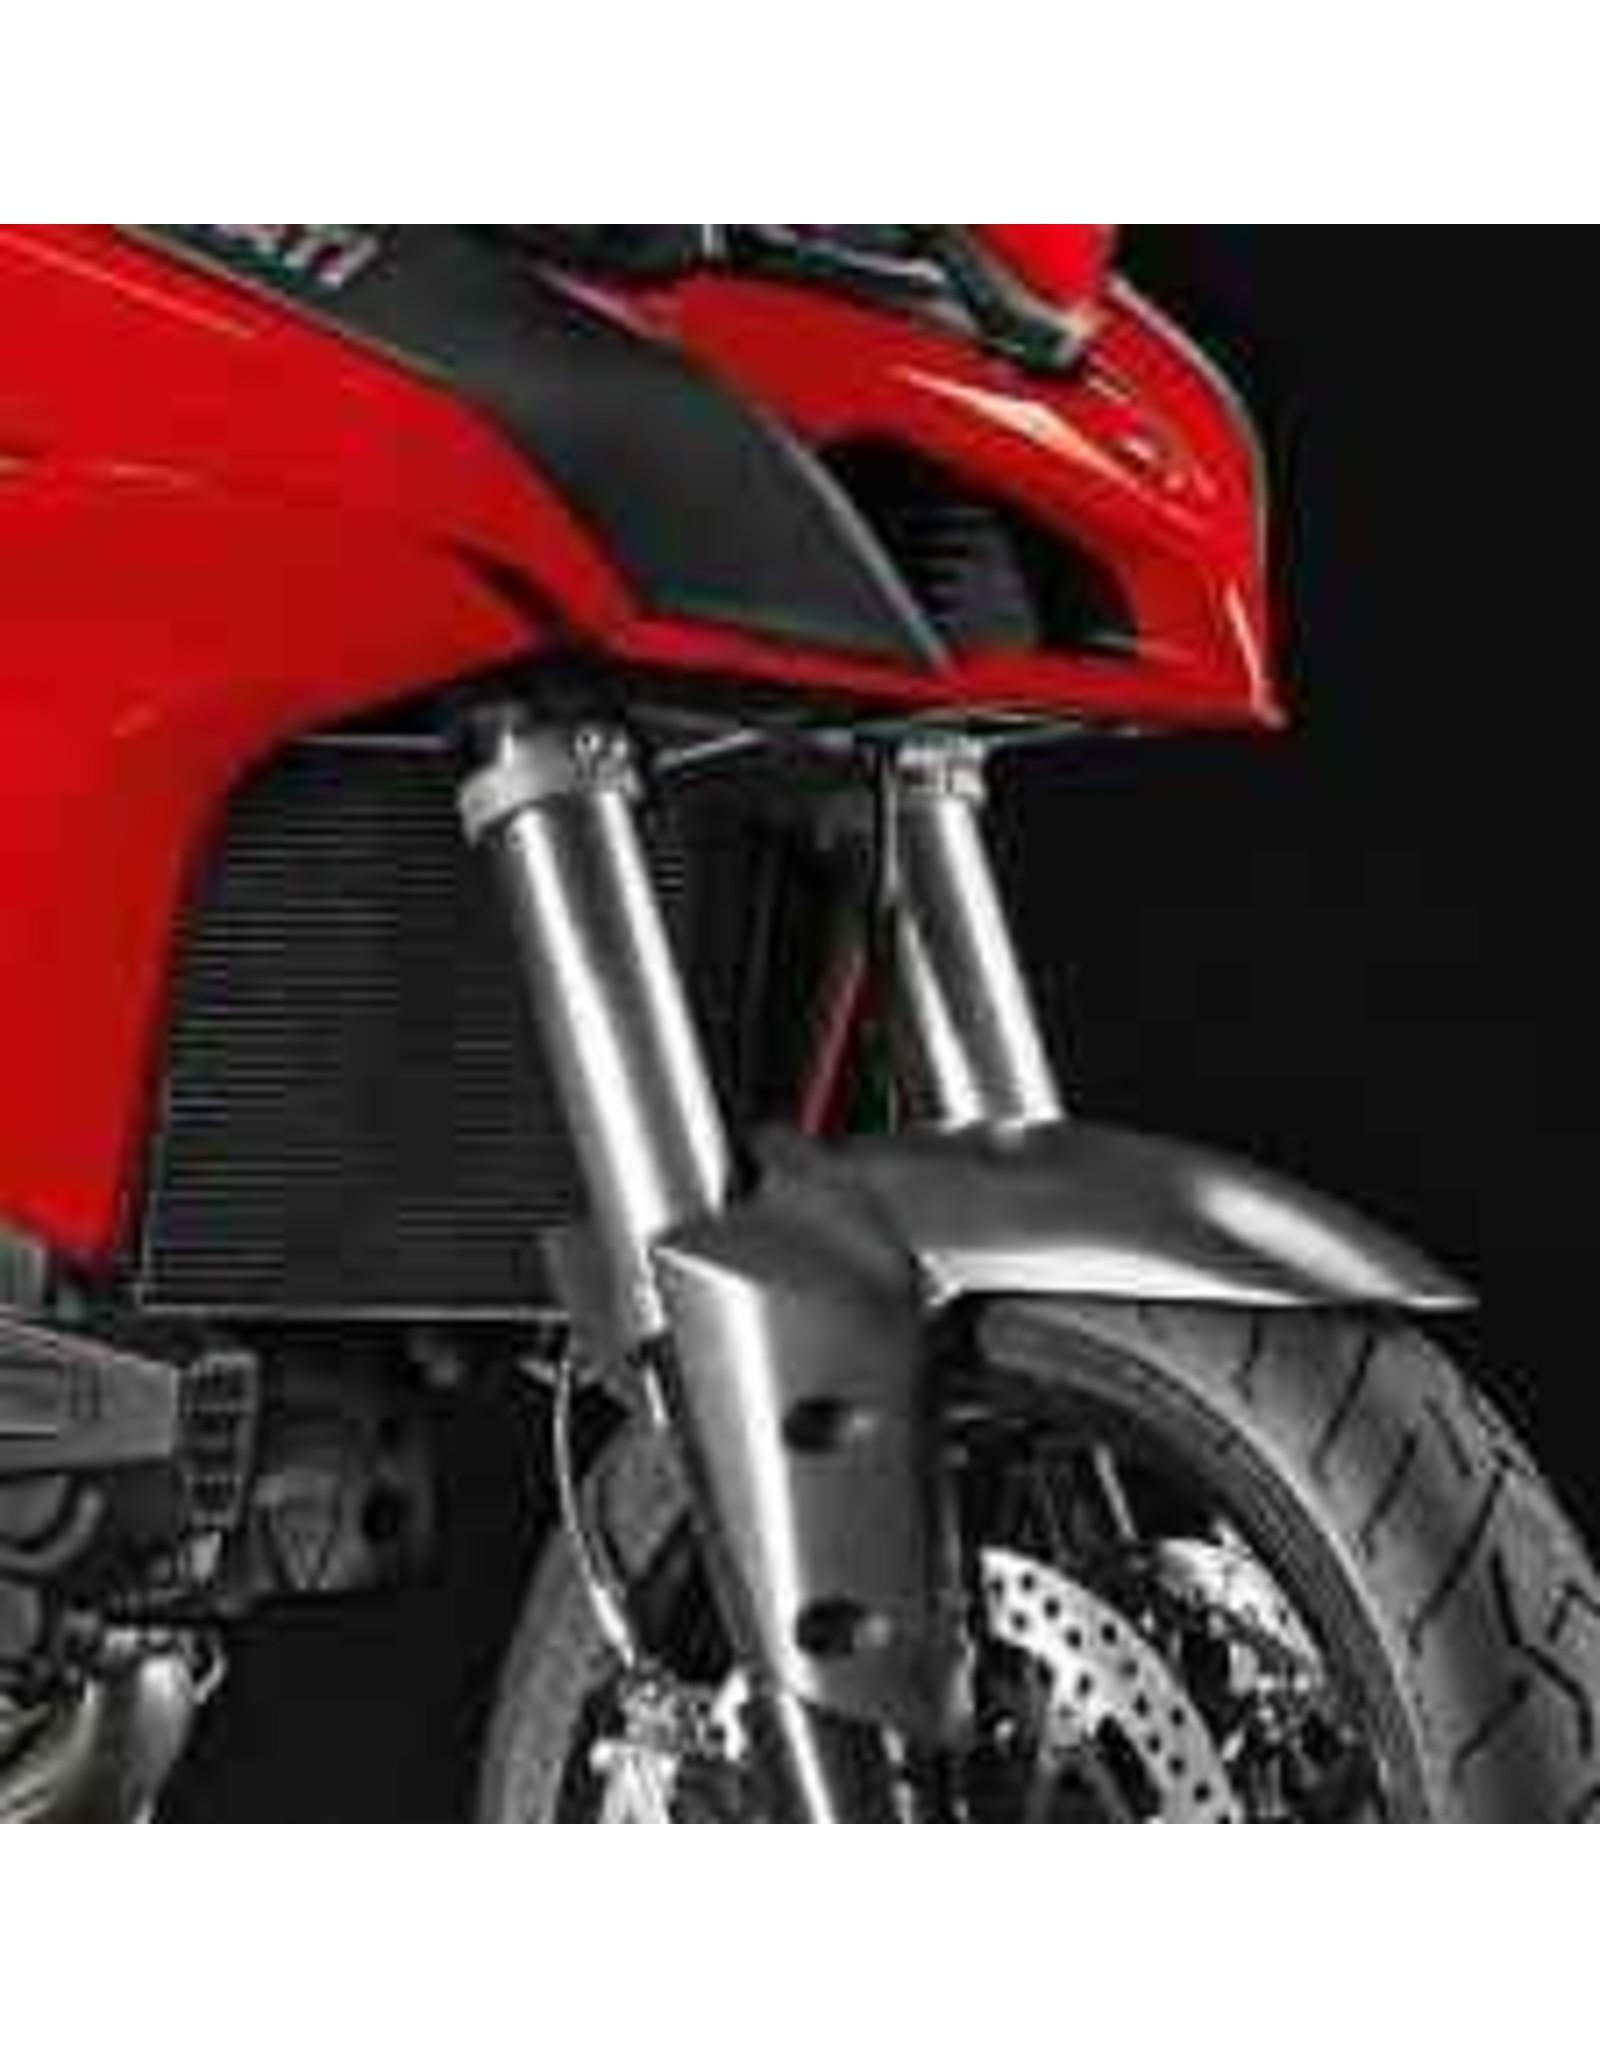 Ducati DUCATI  MULTISTRADA 1200s 1200 S CARBON FIBER FRONT FENDER MUDGUARD 969A01110B